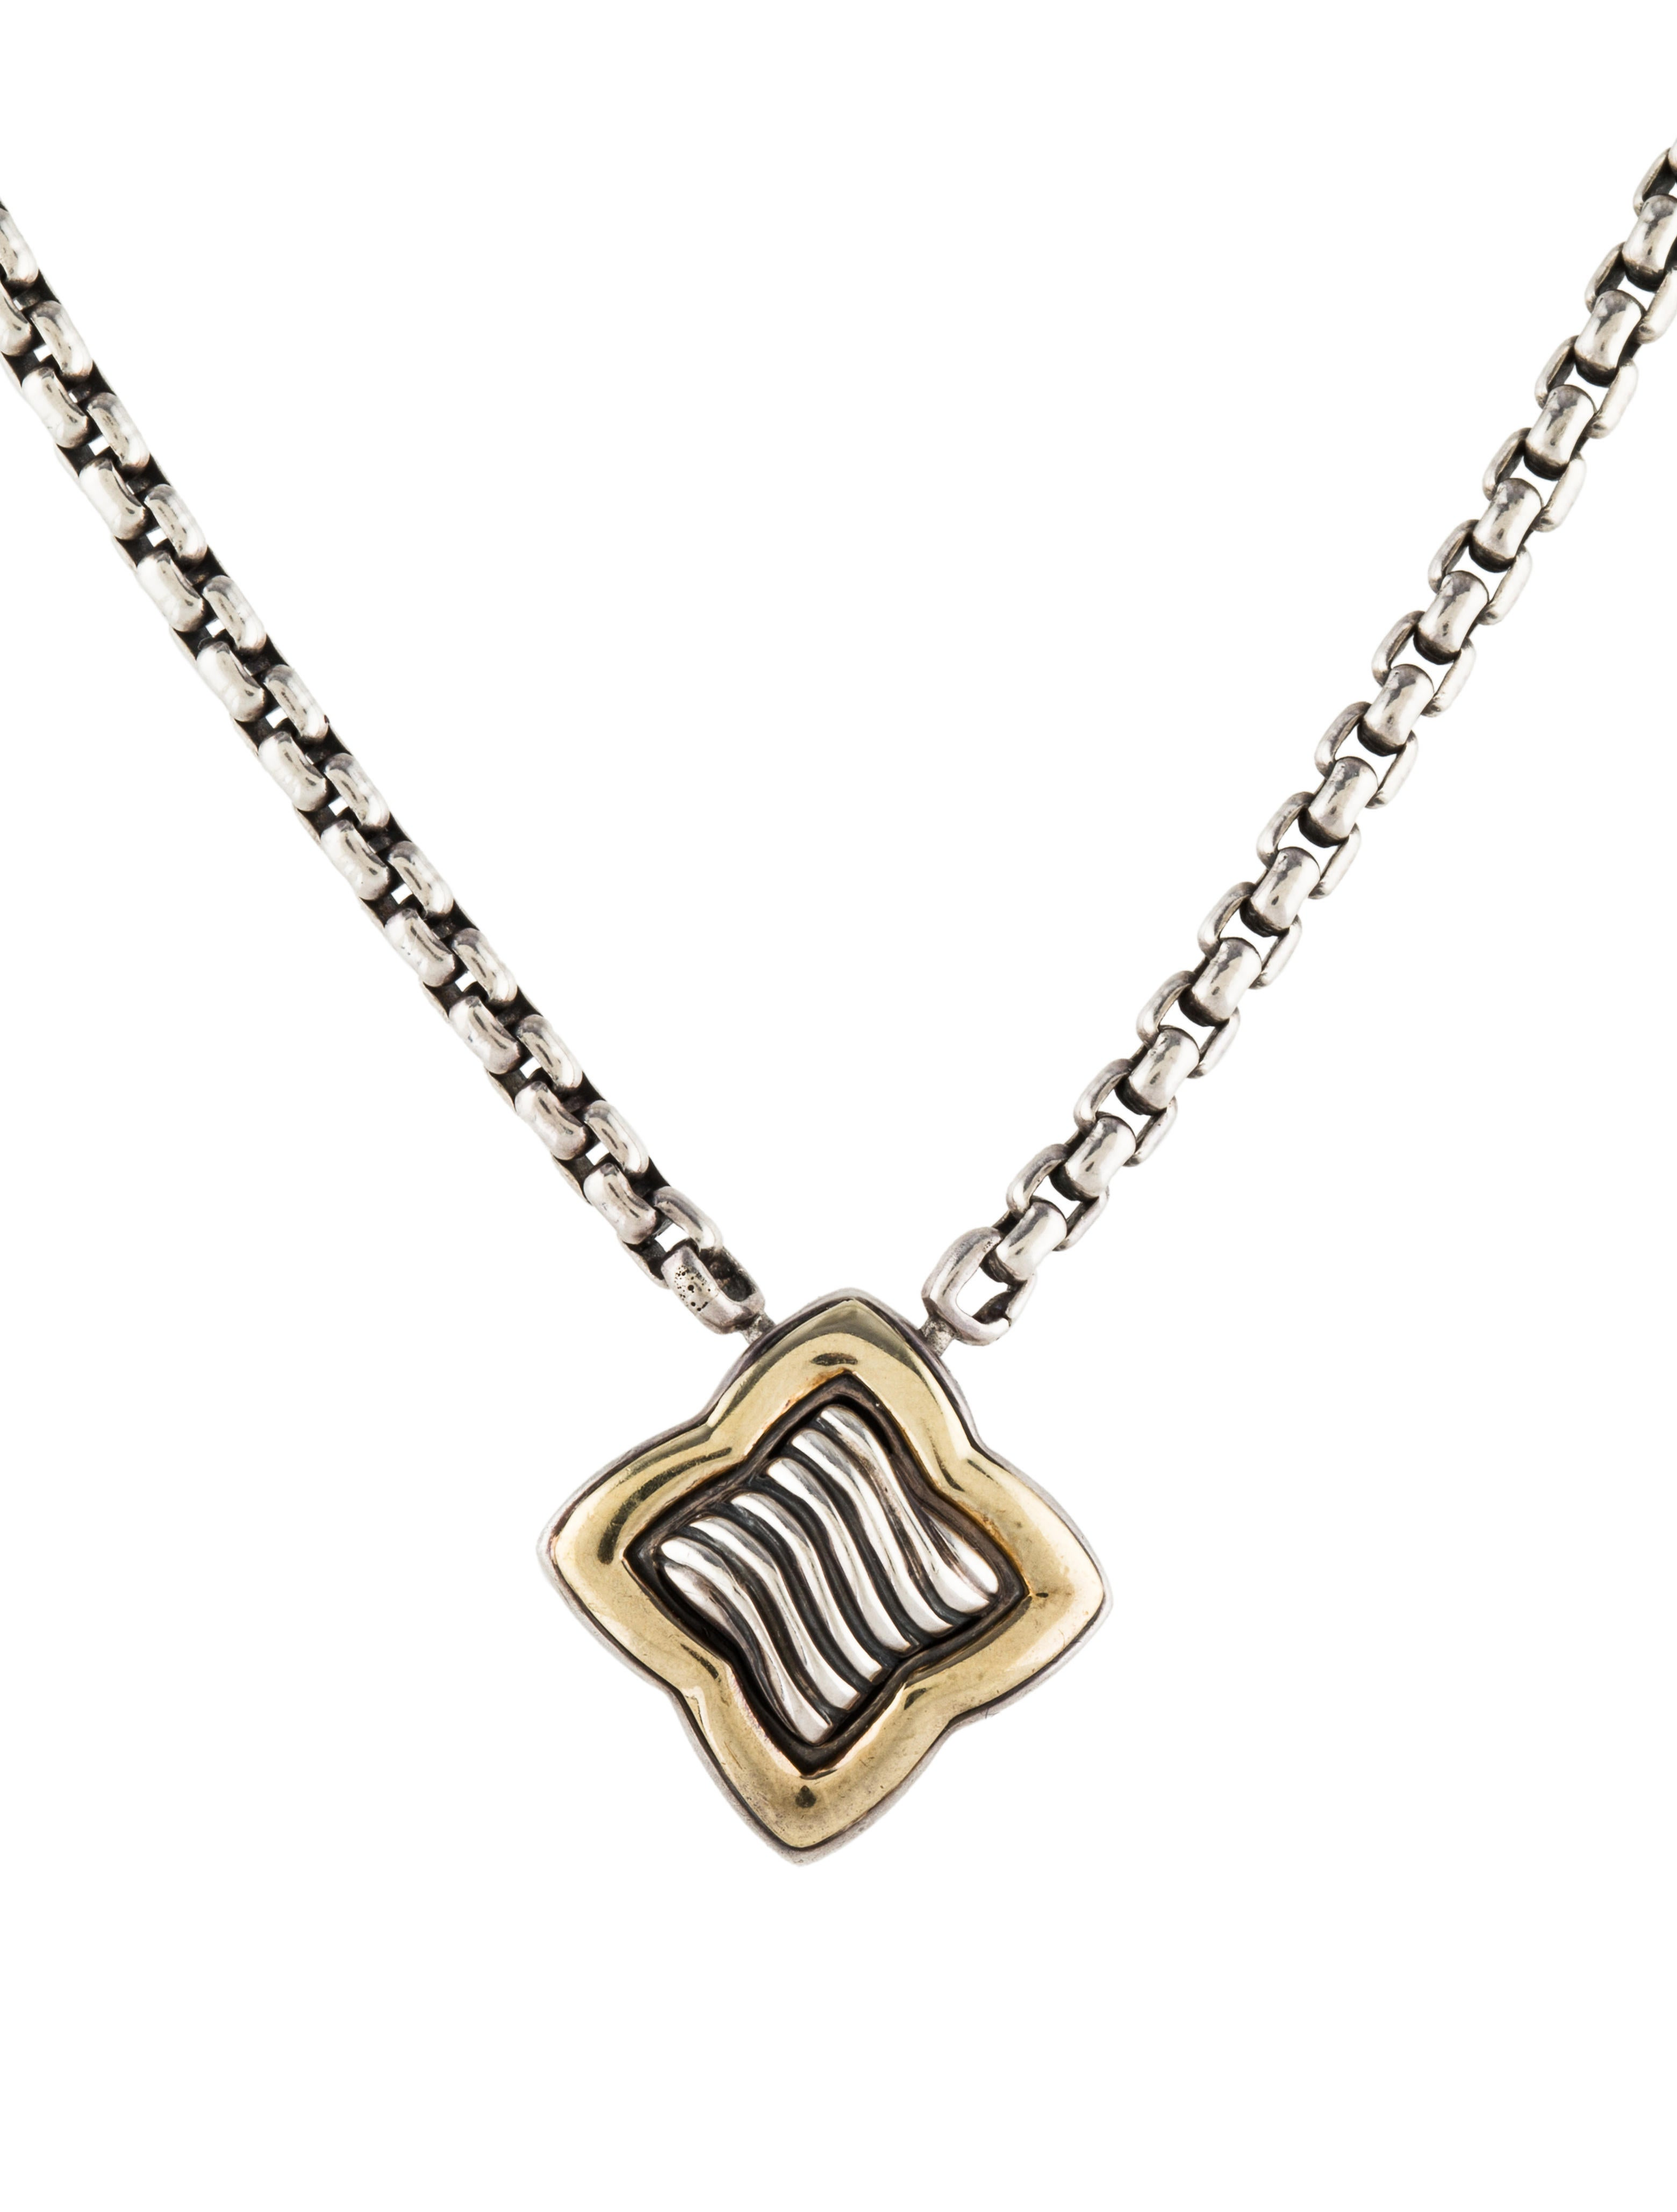 David yurman two tone quatrefoil pendant necklace necklaces two tone quatrefoil pendant necklace aloadofball Choice Image